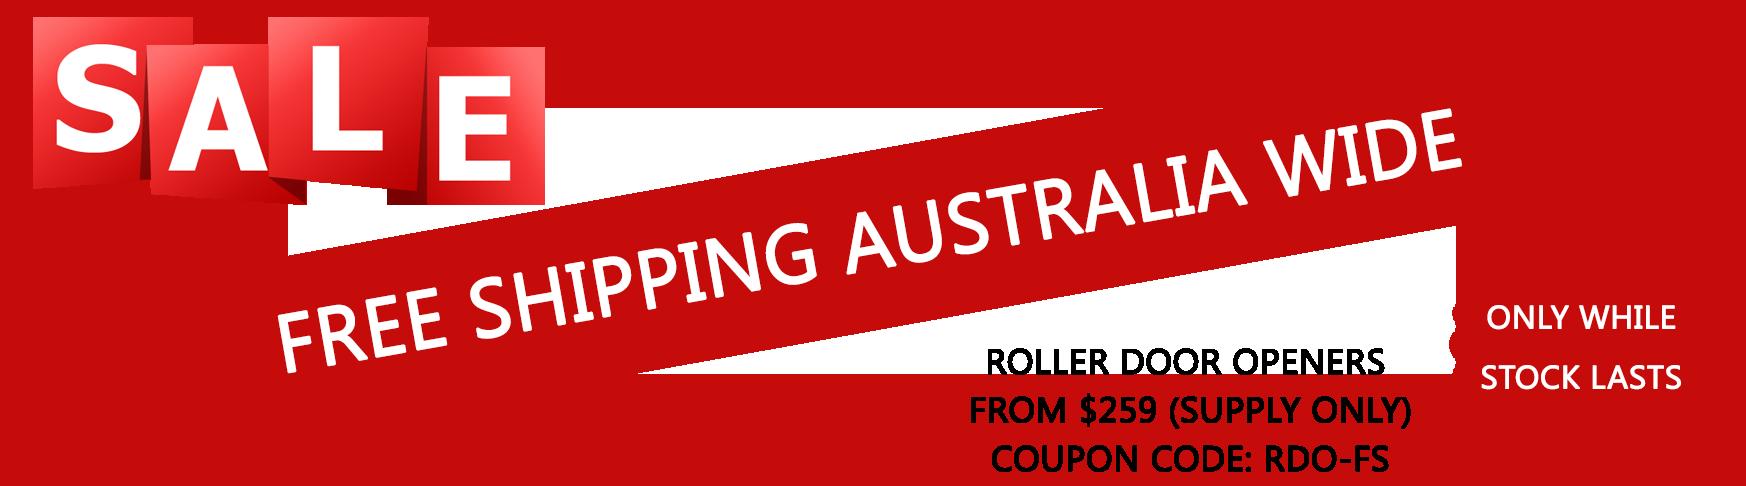 Roller garage door openers special offer- free shipping Australia